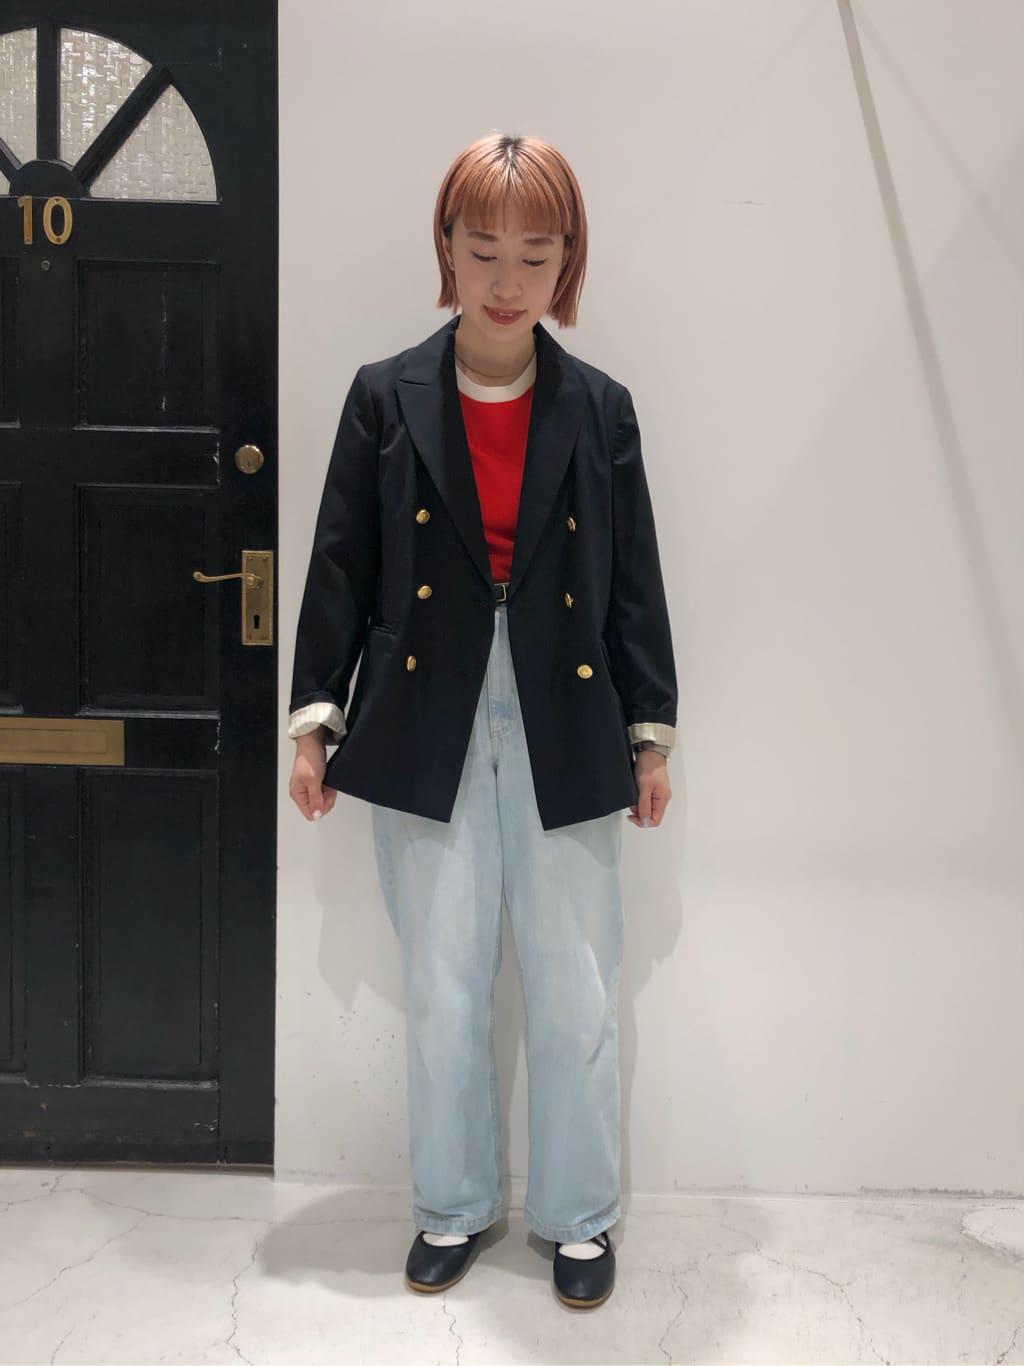 Dot and Stripes CHILD WOMAN ルクアイーレ 身長:157cm 2021.09.01